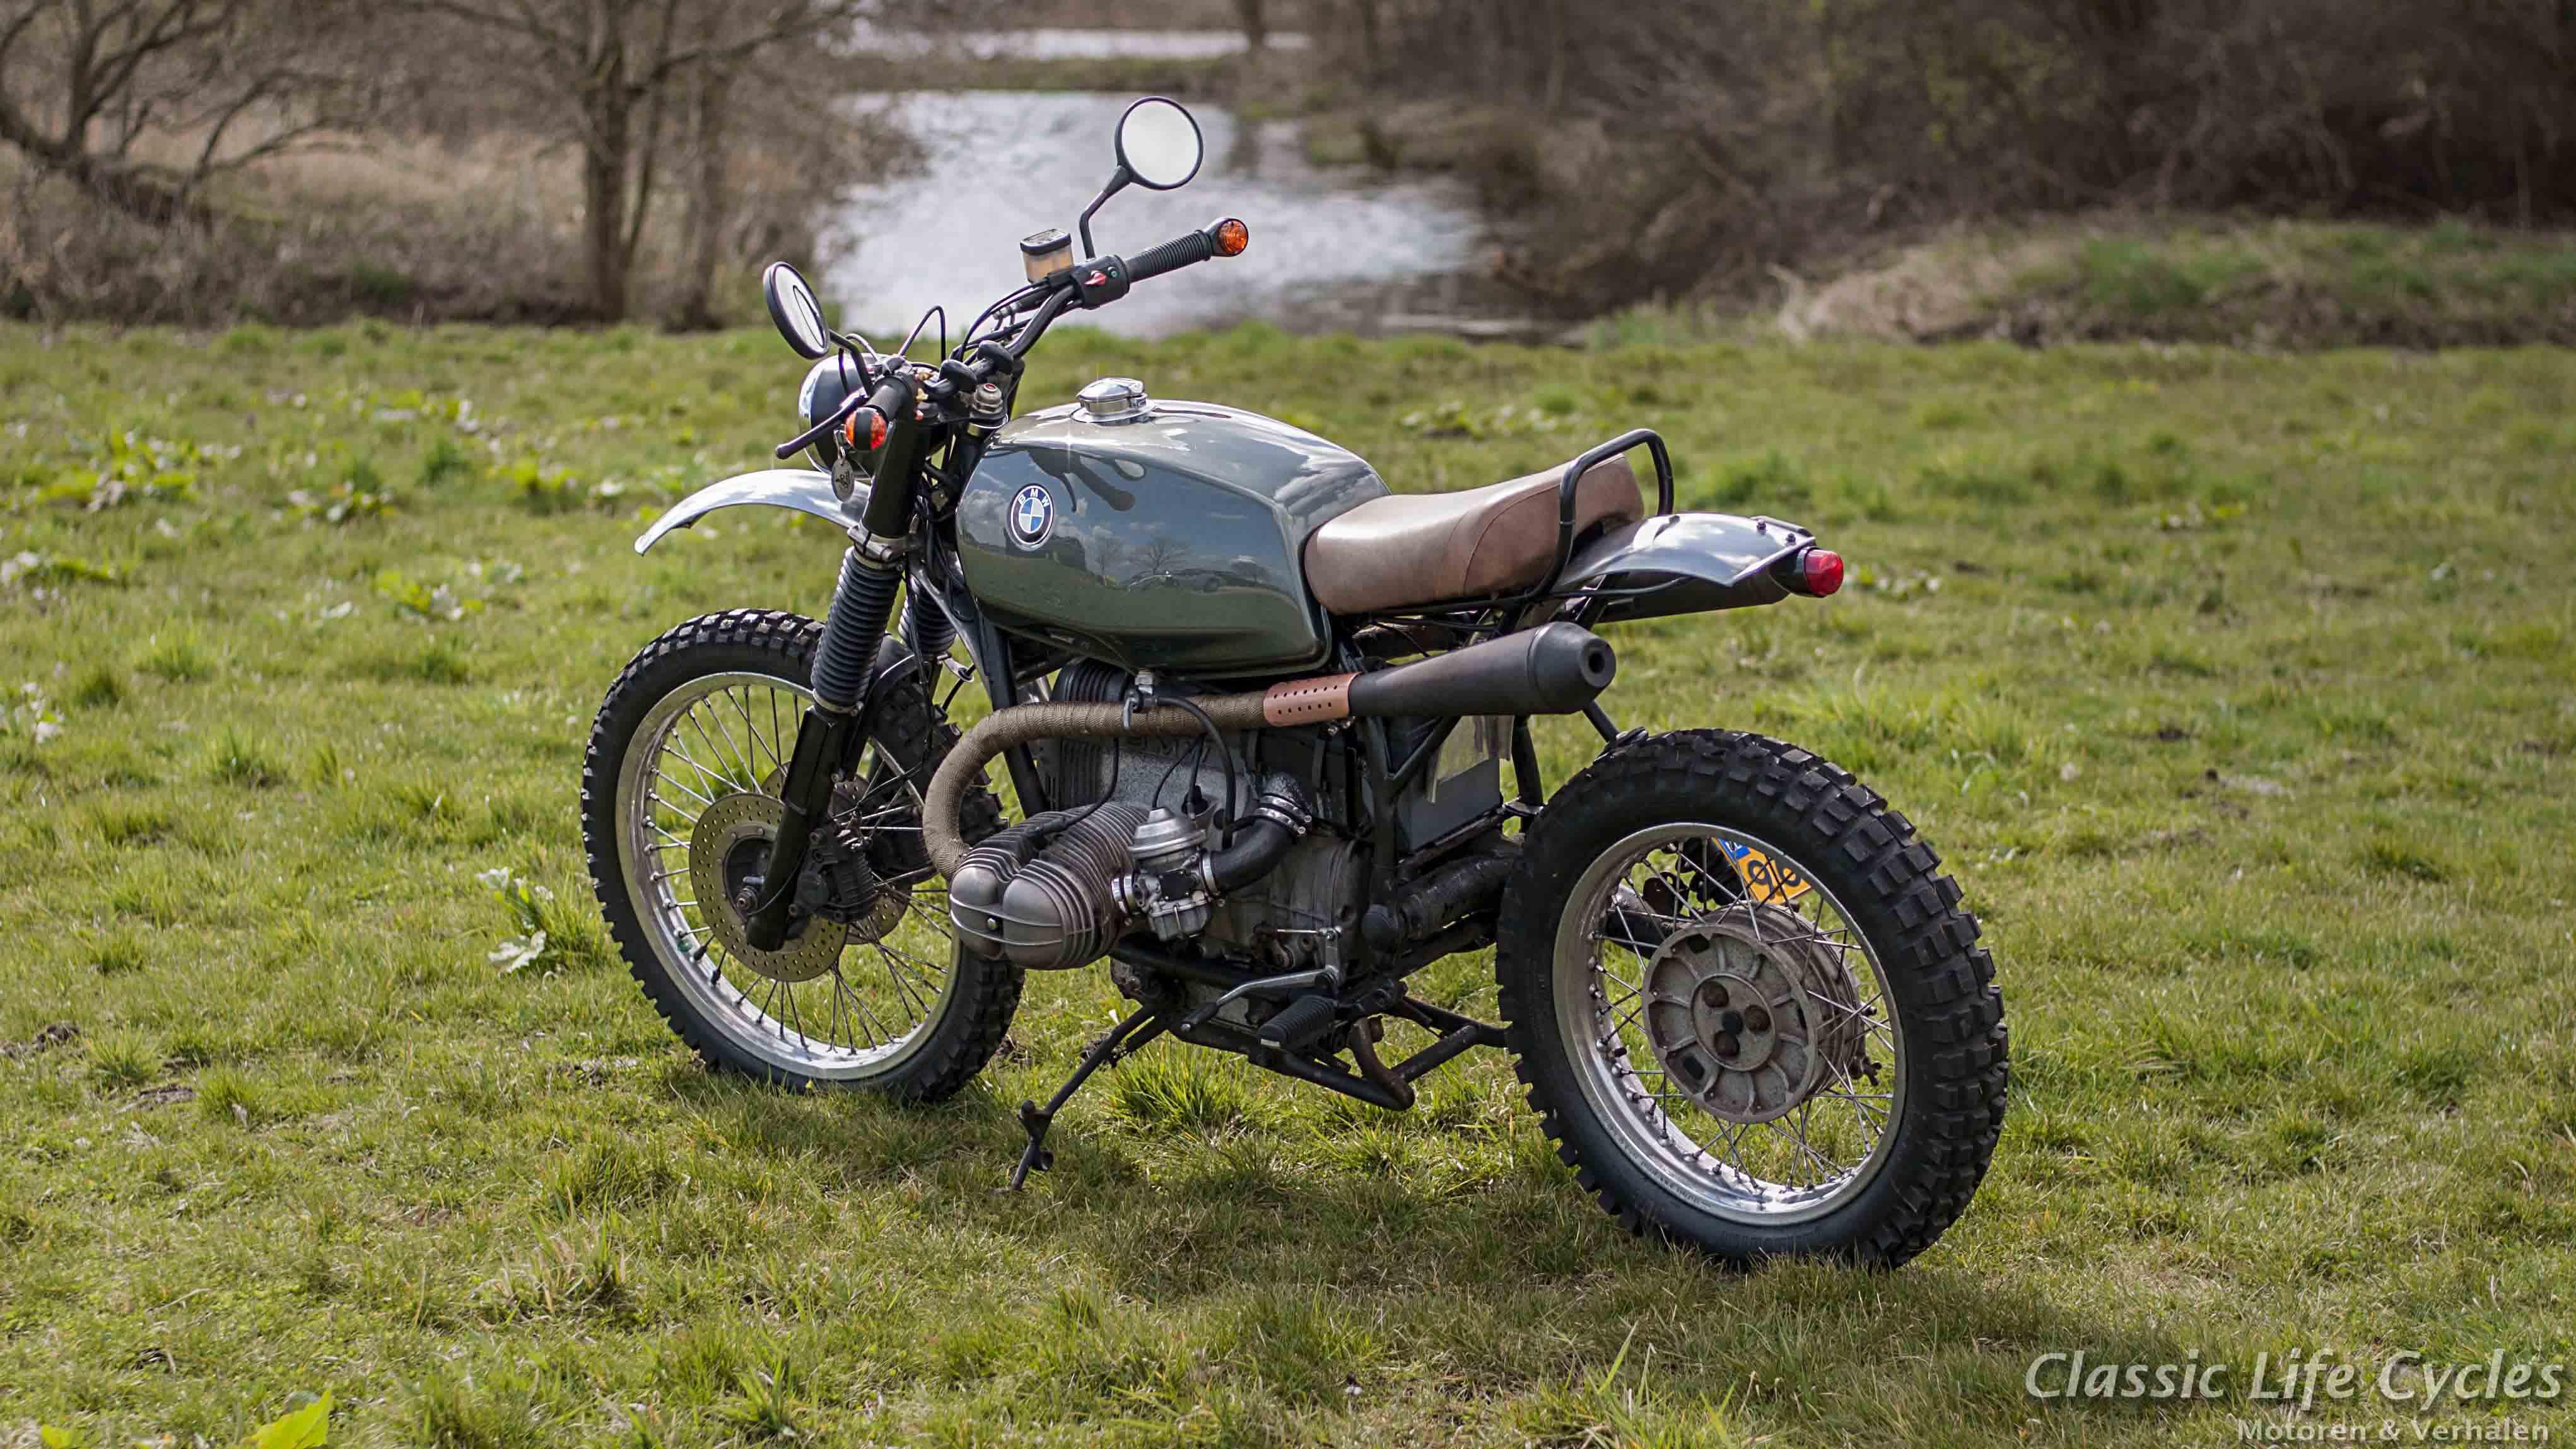 Fabuleux Paul's Motorcycles - BMW R80 Scrambler QC05